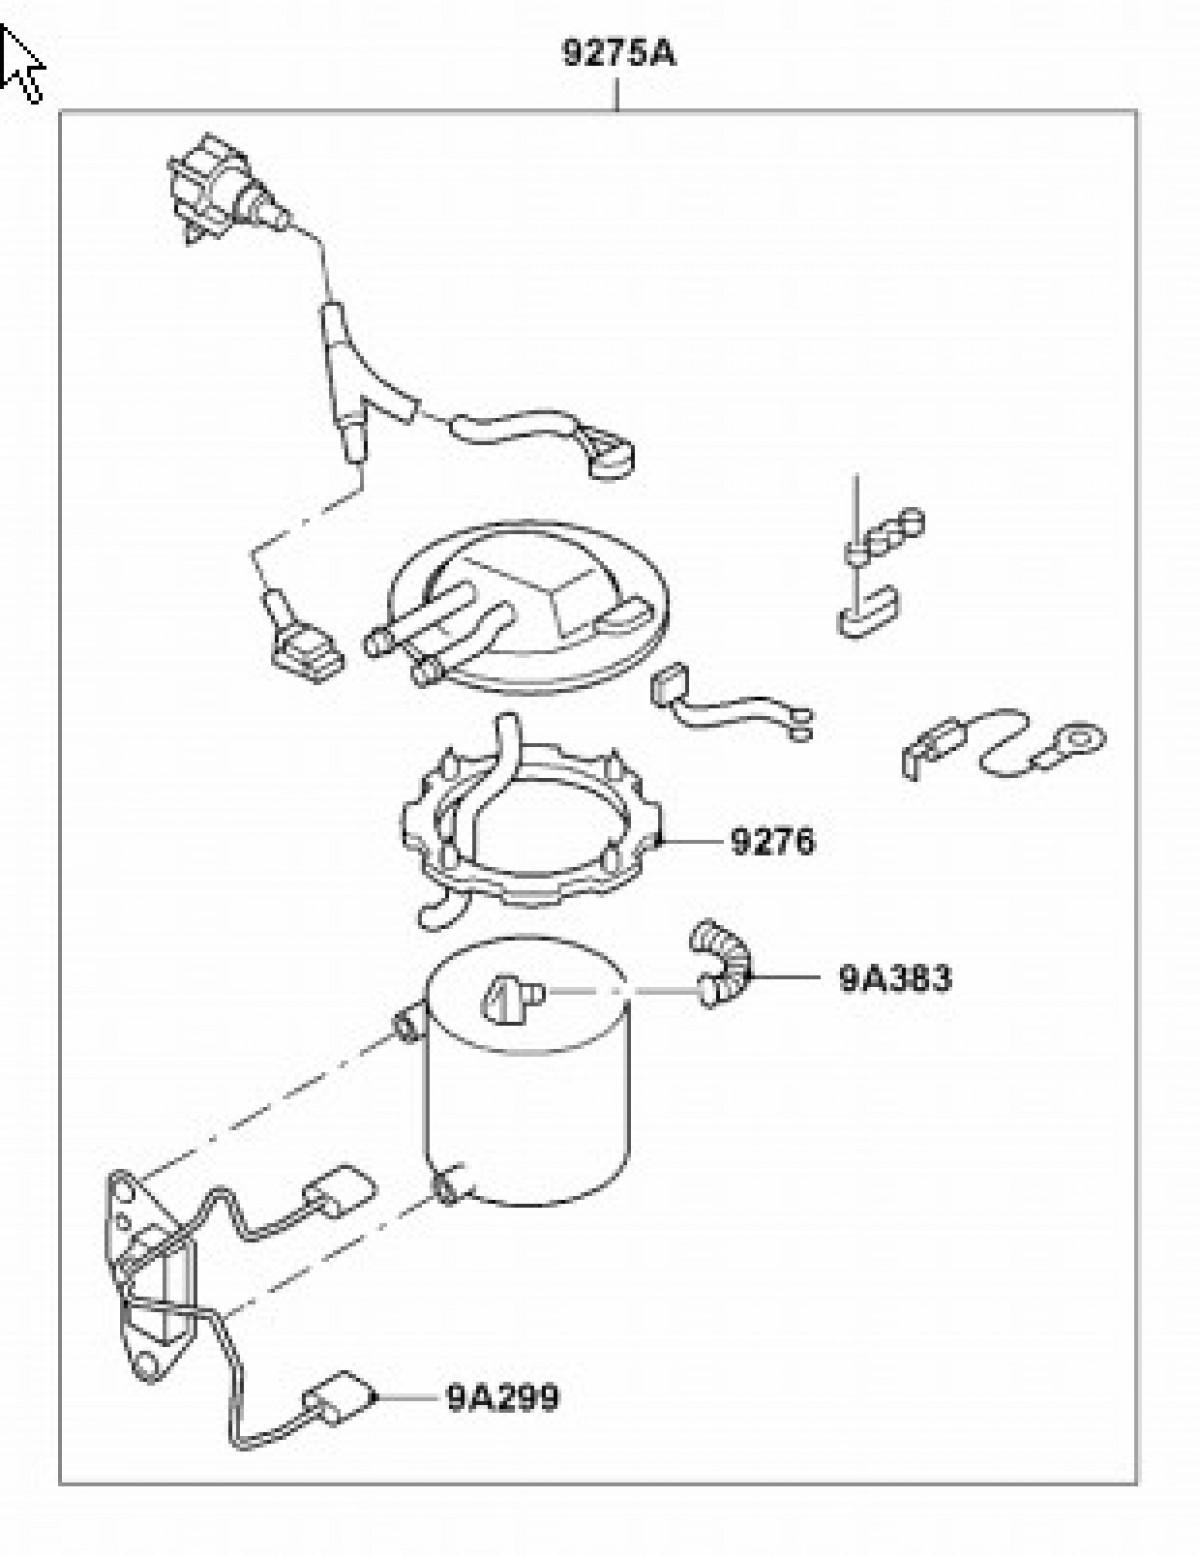 Genuine Ford Fuel Pump Sender Assembly